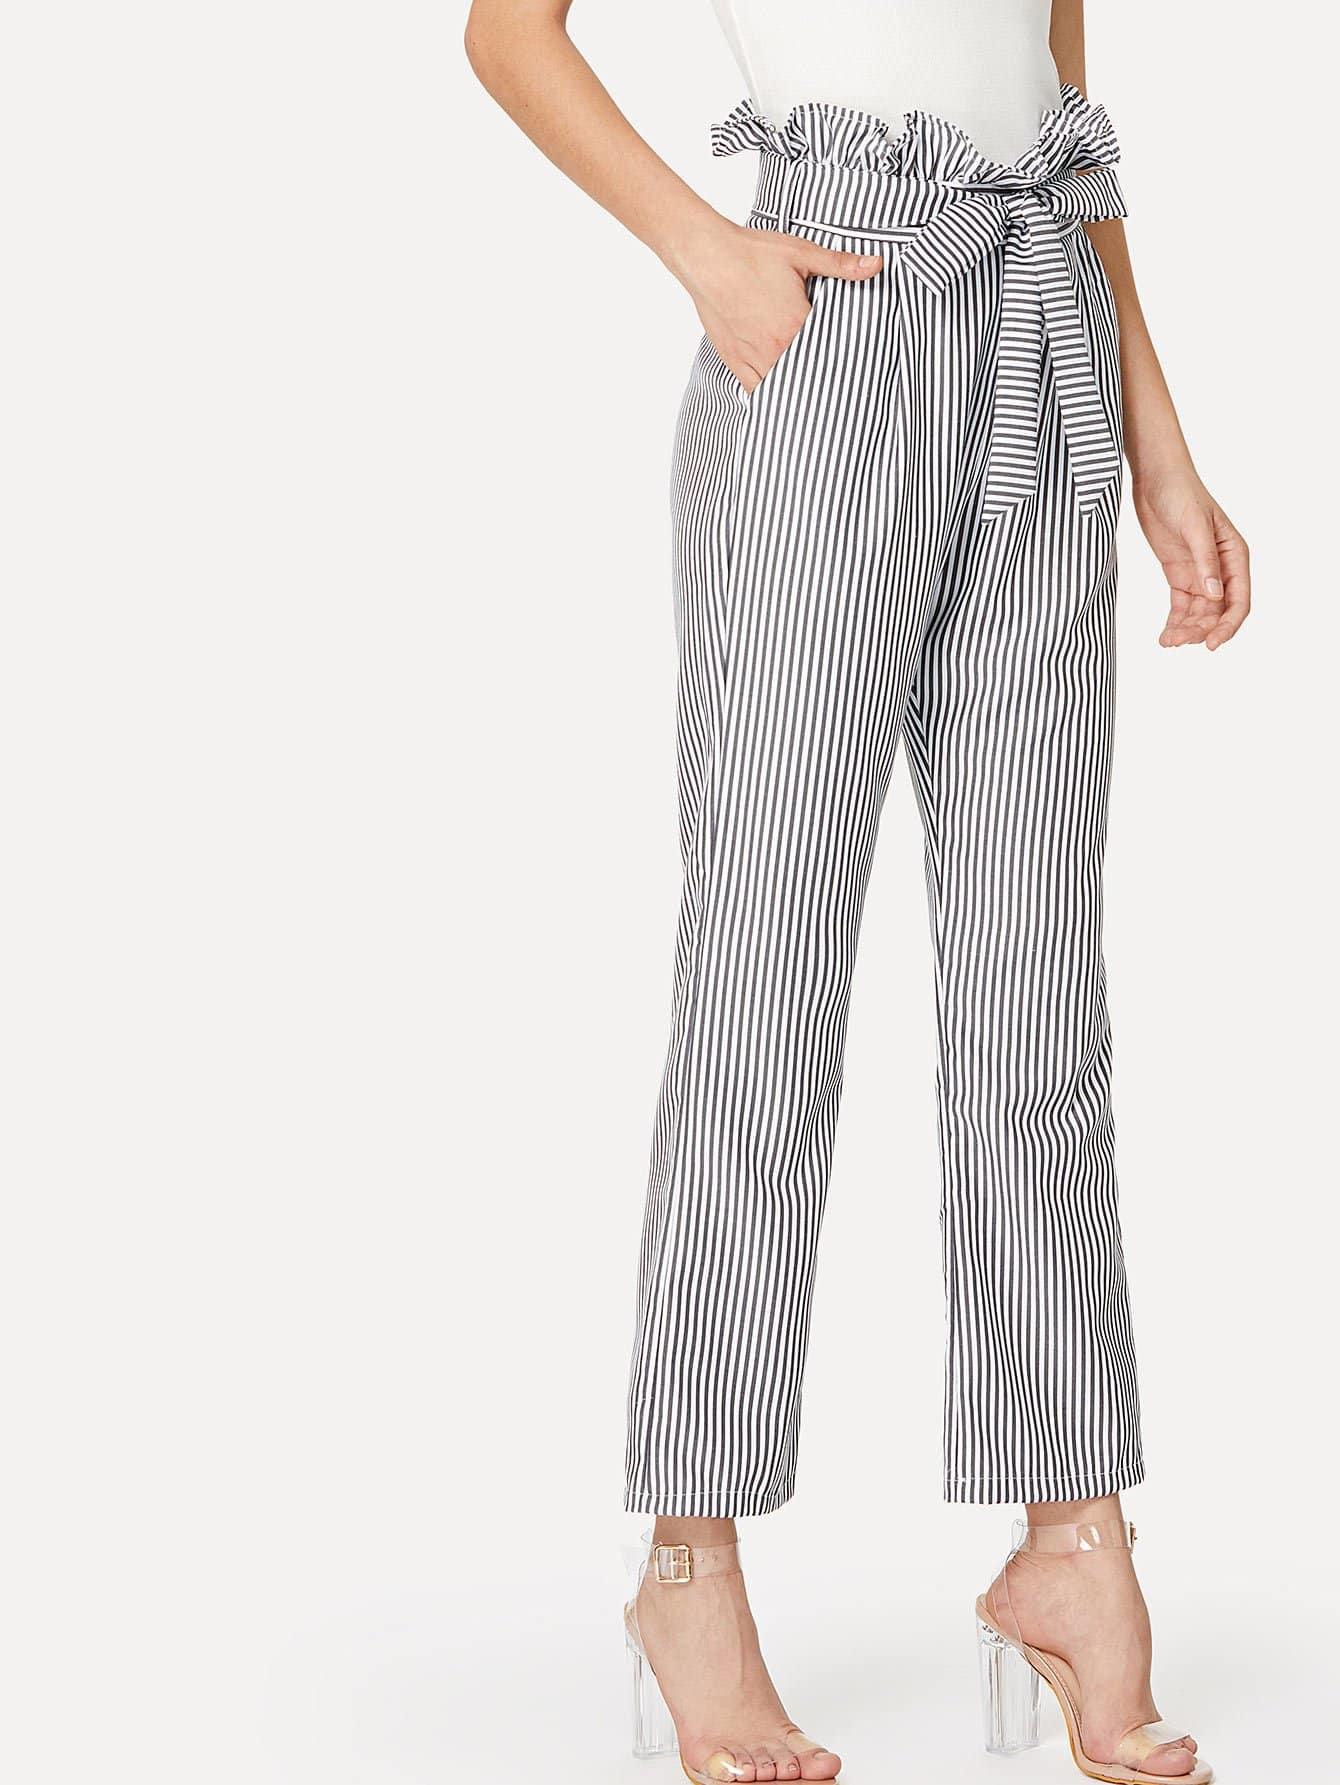 Self Belt Striped Wide Leg Pants With Ruffle Waist ruffle waist belted peg pants